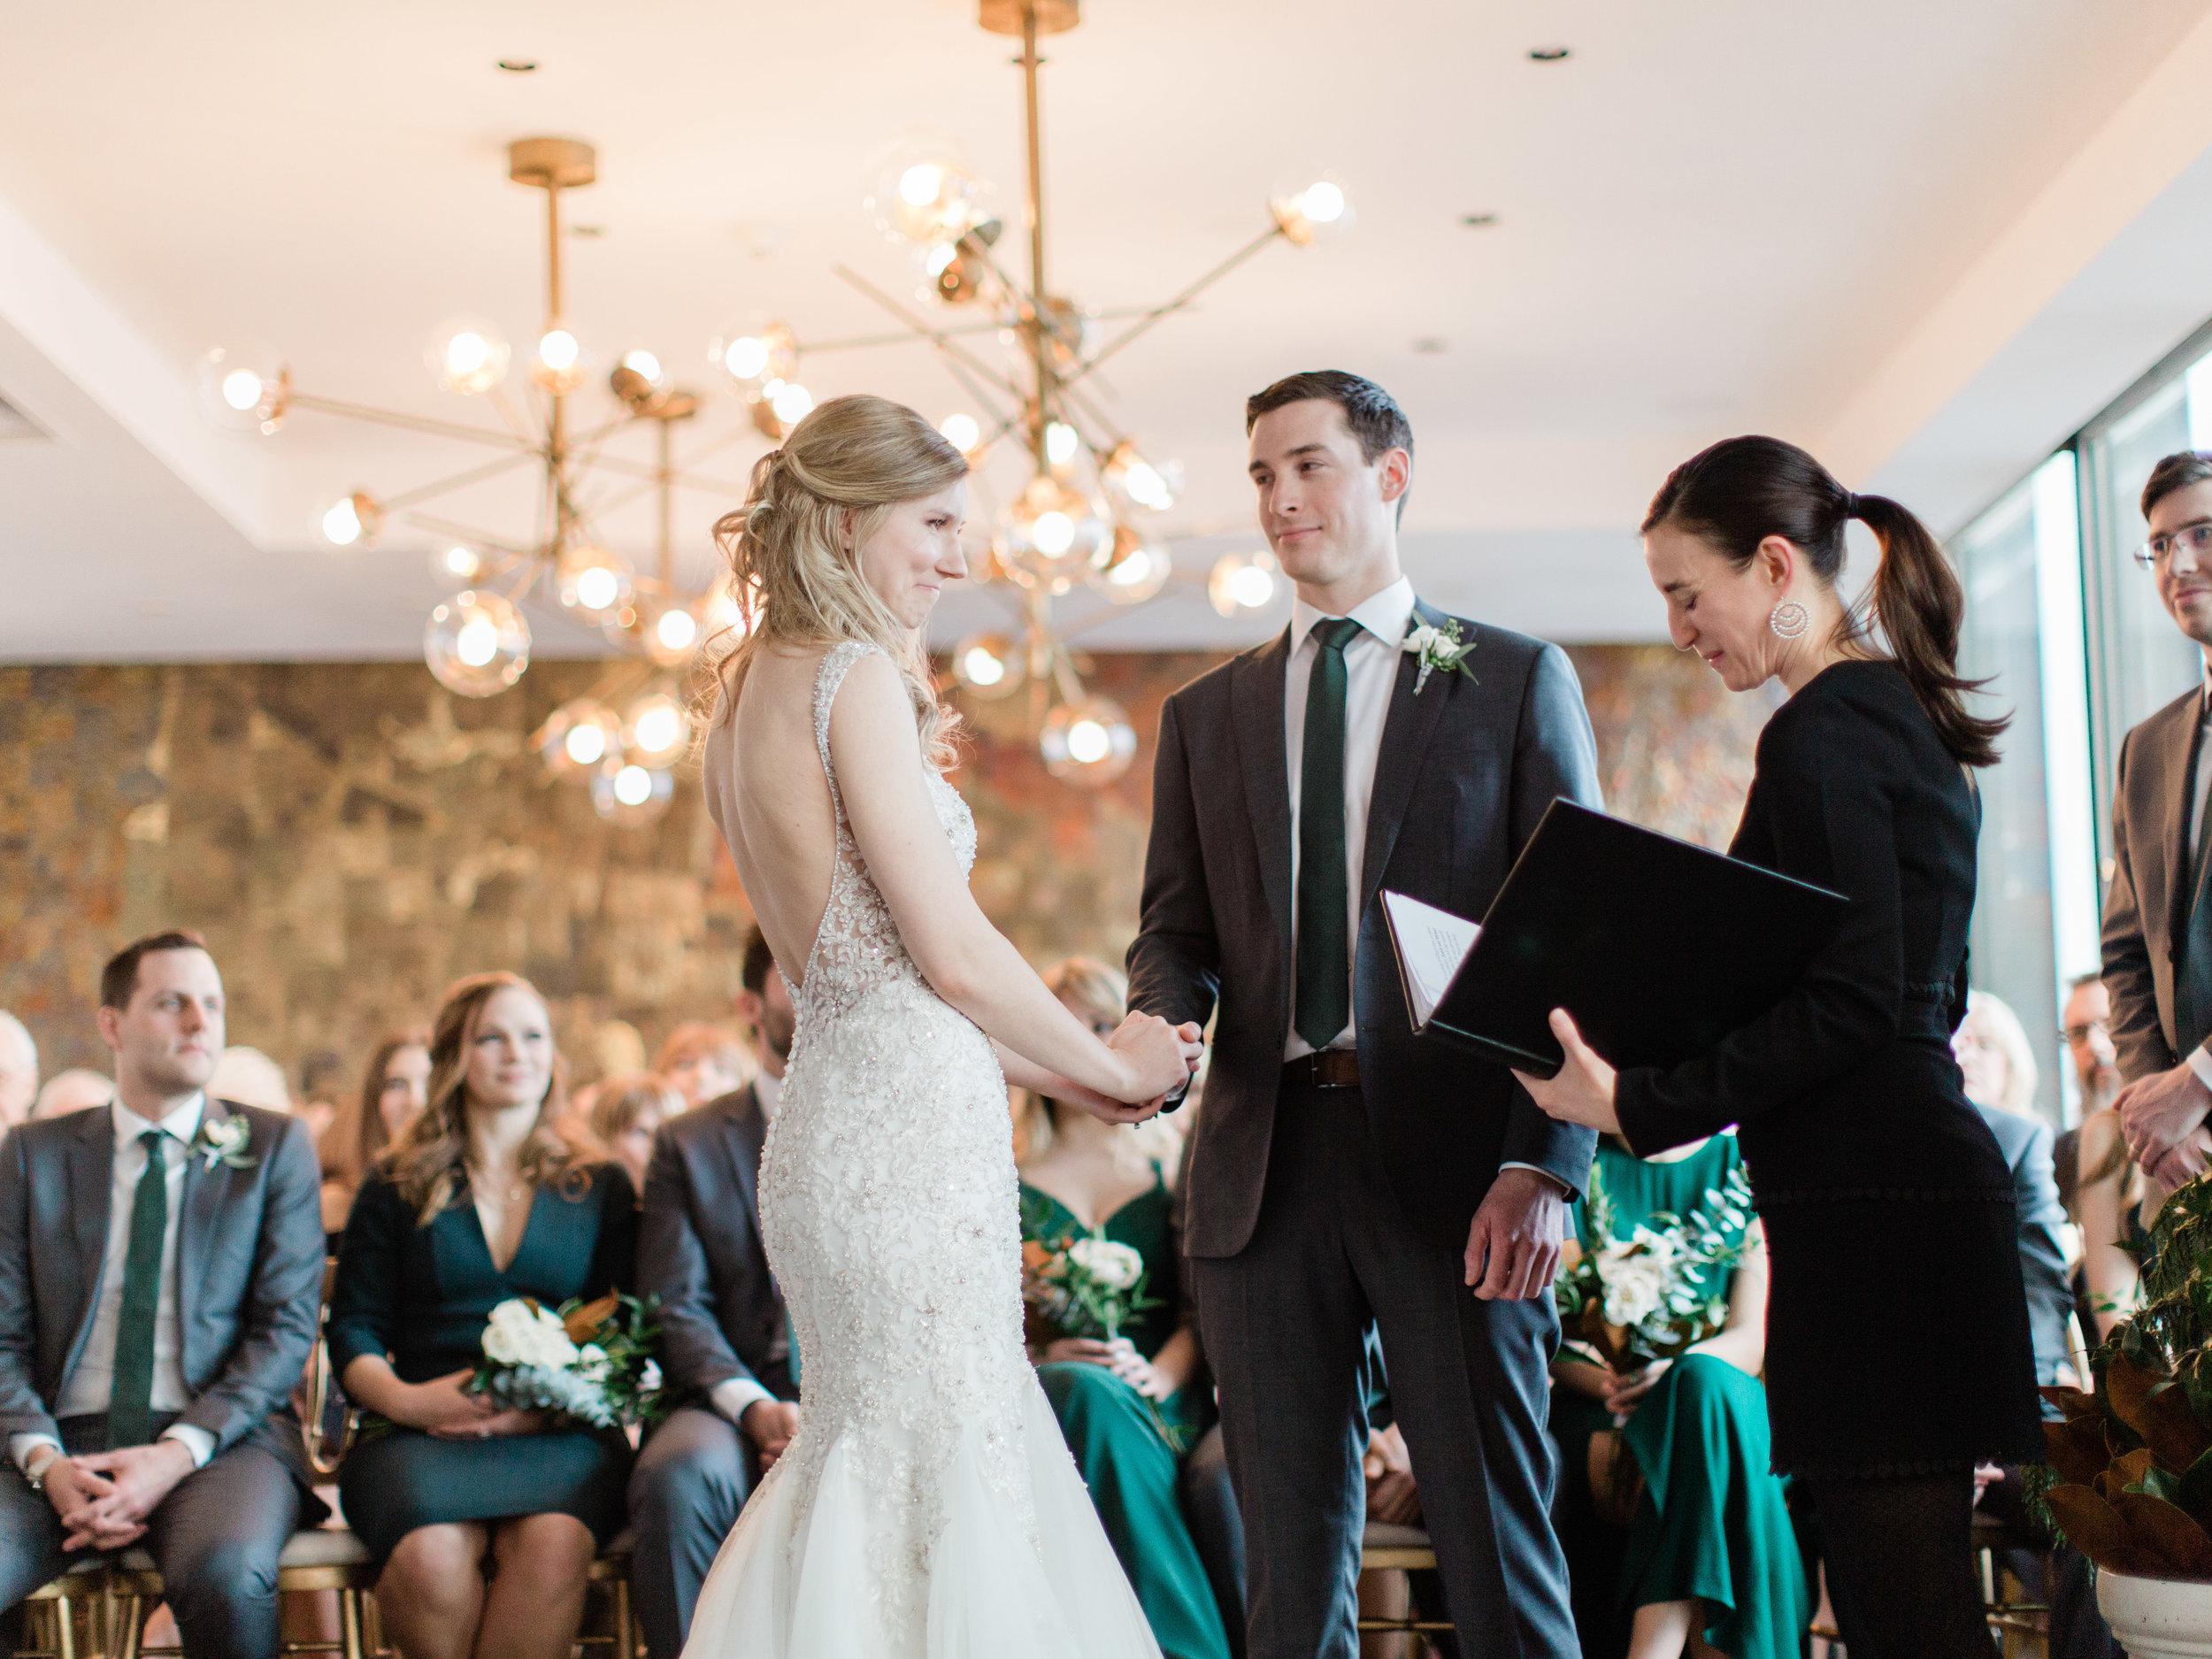 Toronto-wedding-photographer-downtown-winter-wedding-intimate-restaurant-canoe135.jpg